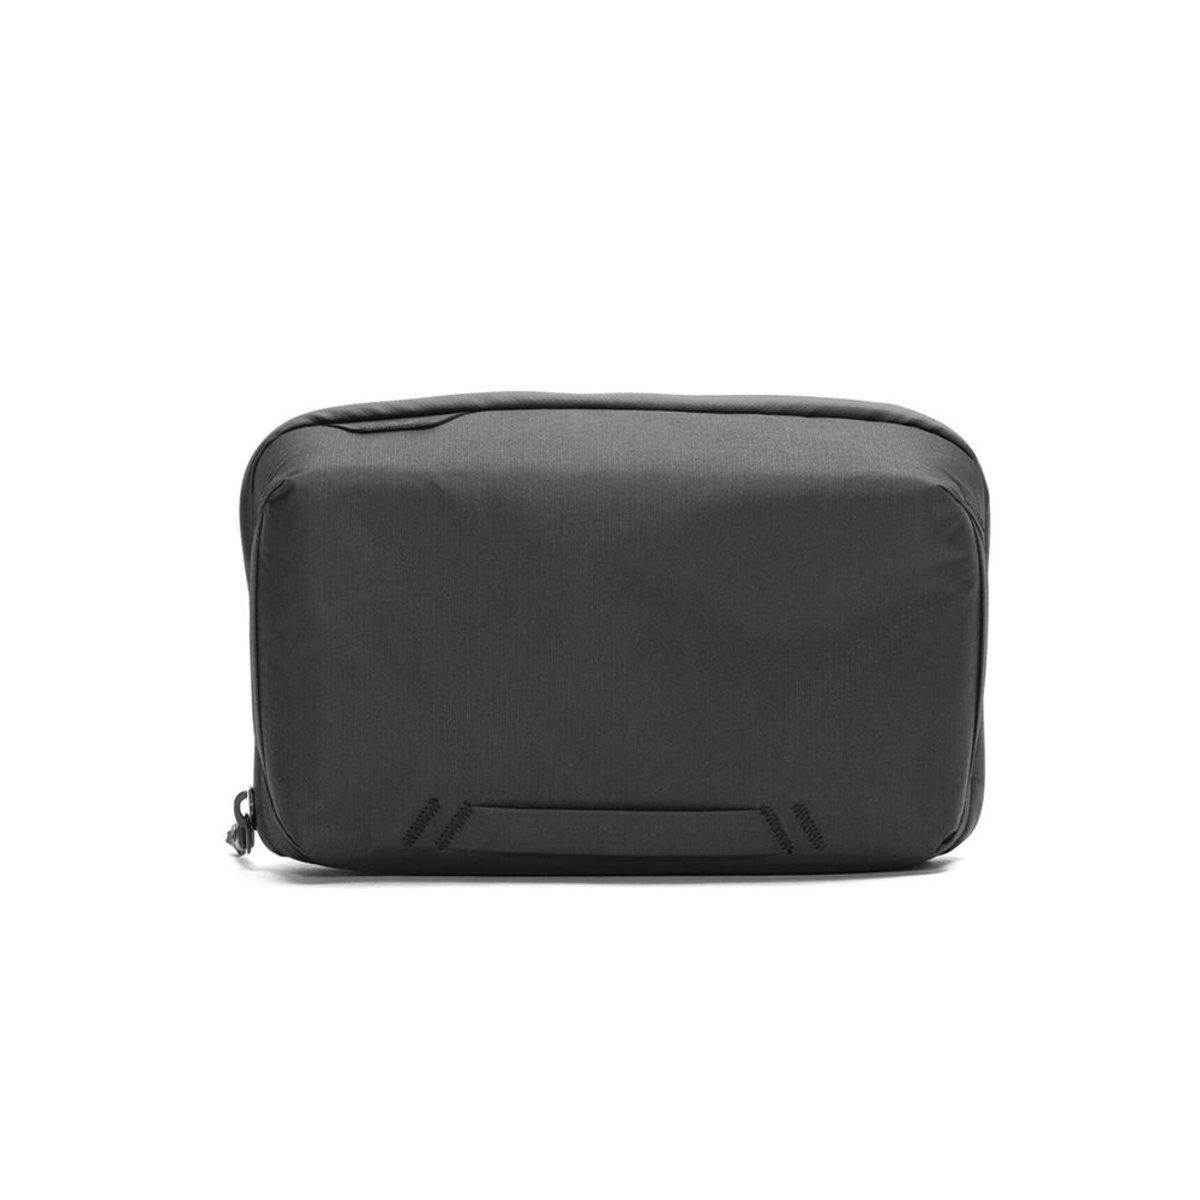 TECH POUCH Bag MultiFunction Storage Bag BLACK